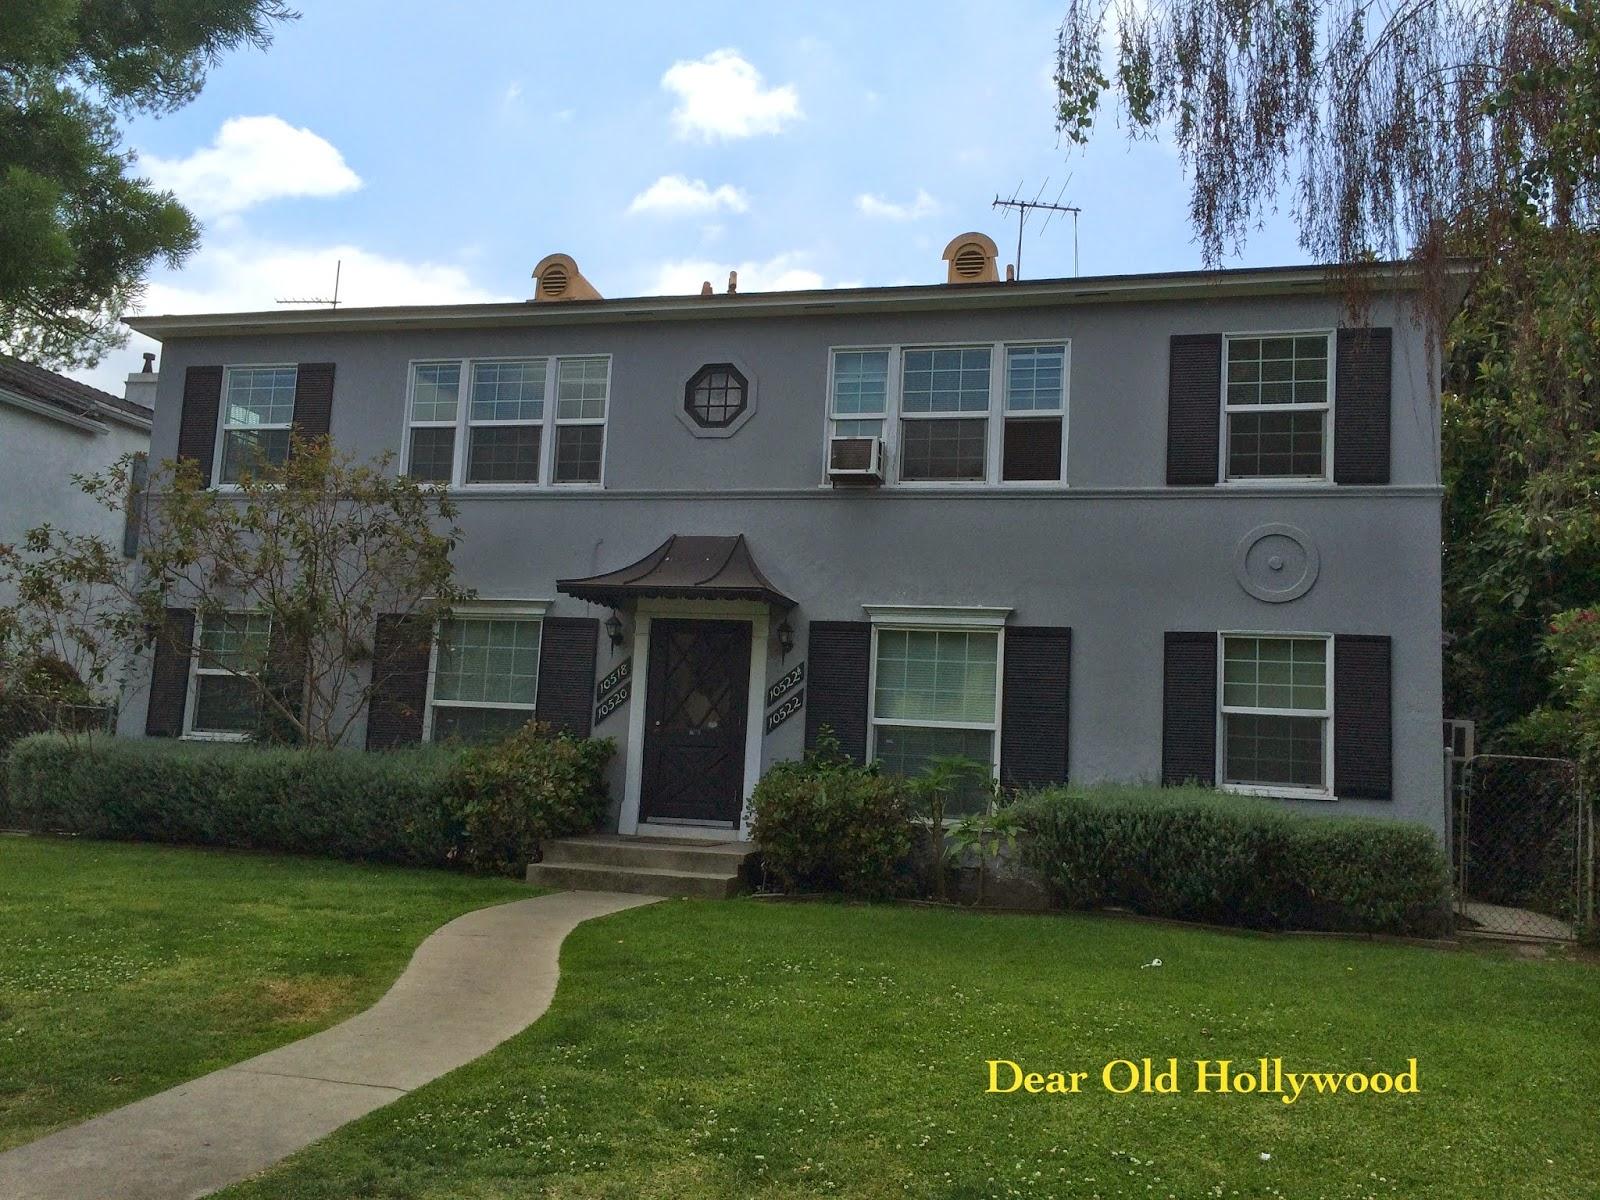 Dear Old Hollywood The Toluca Lake Homes Of Shemp Howard